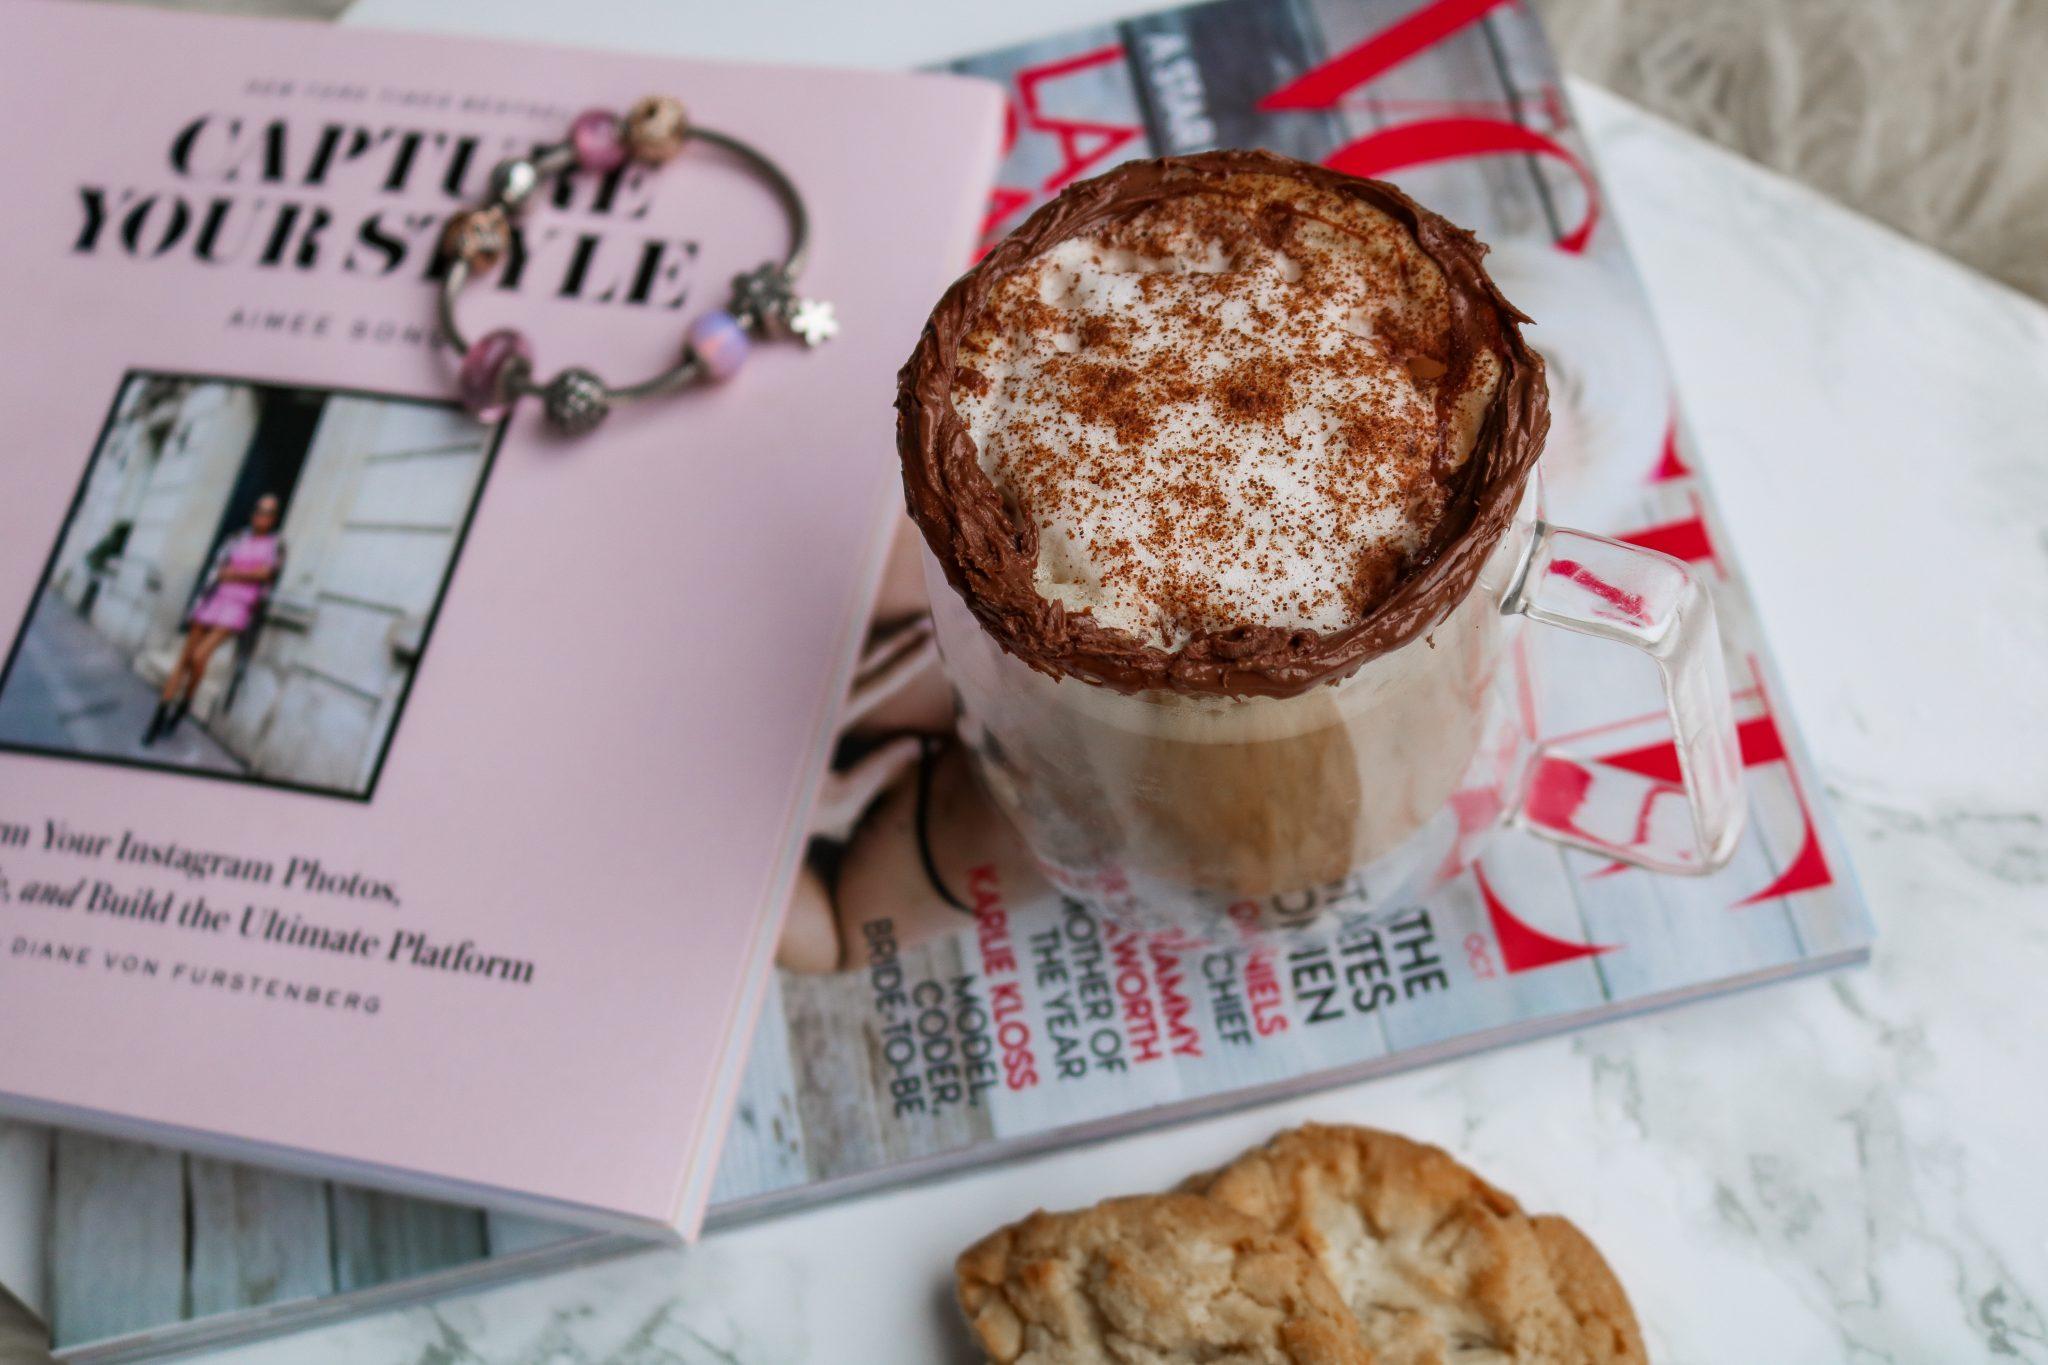 The-Hungarian-Brunette-Nutella-Latte-Recipe-3-of-5.jpg